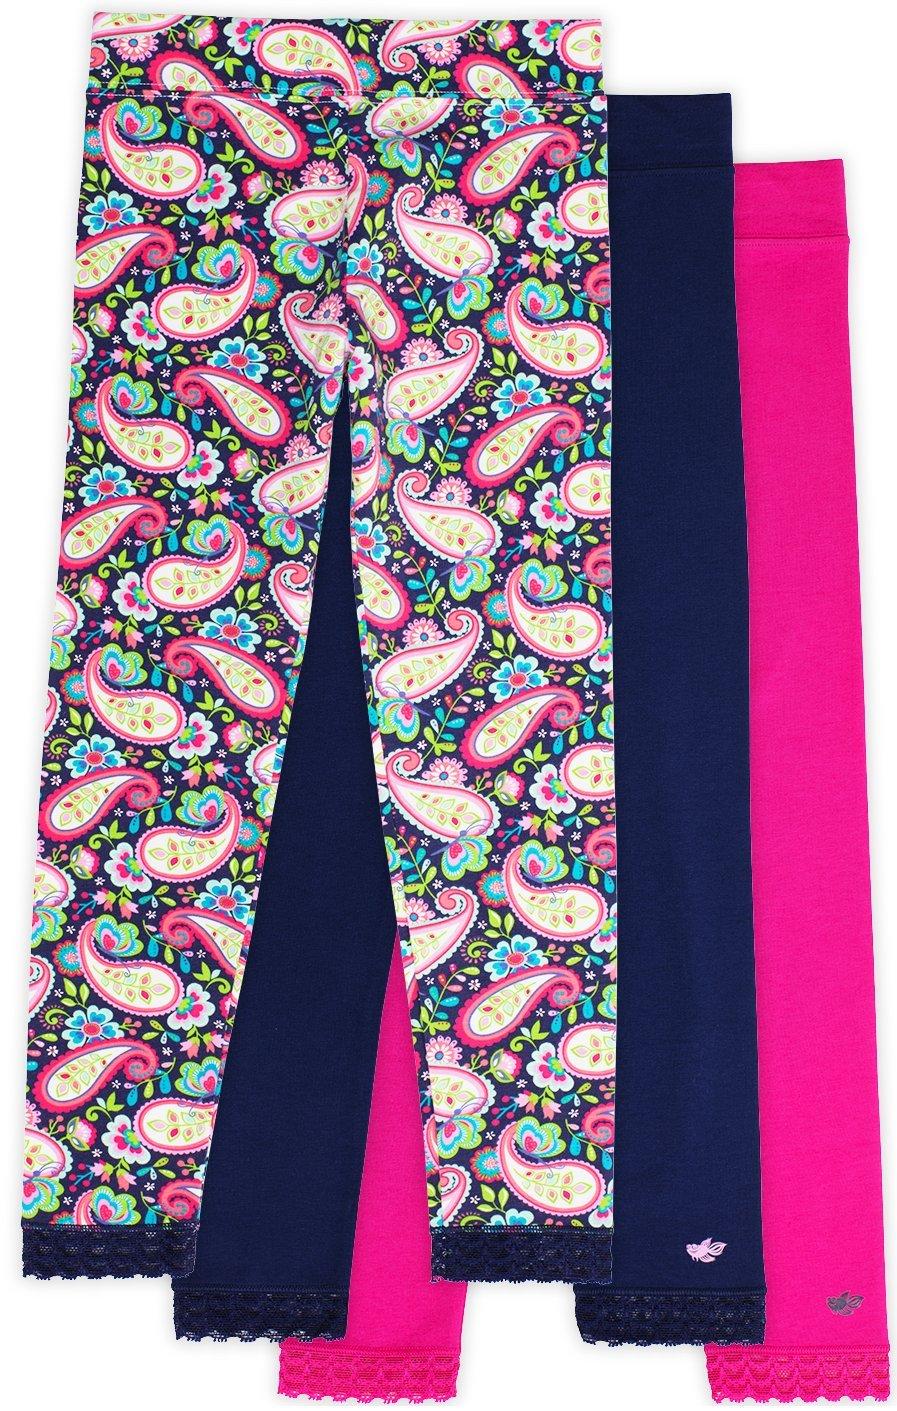 Jada Athletic Leggings for Girls, 3 Pack, Tagless, Lace Trim, Full Length, Pink/Navy/Paisley Print, 7/8